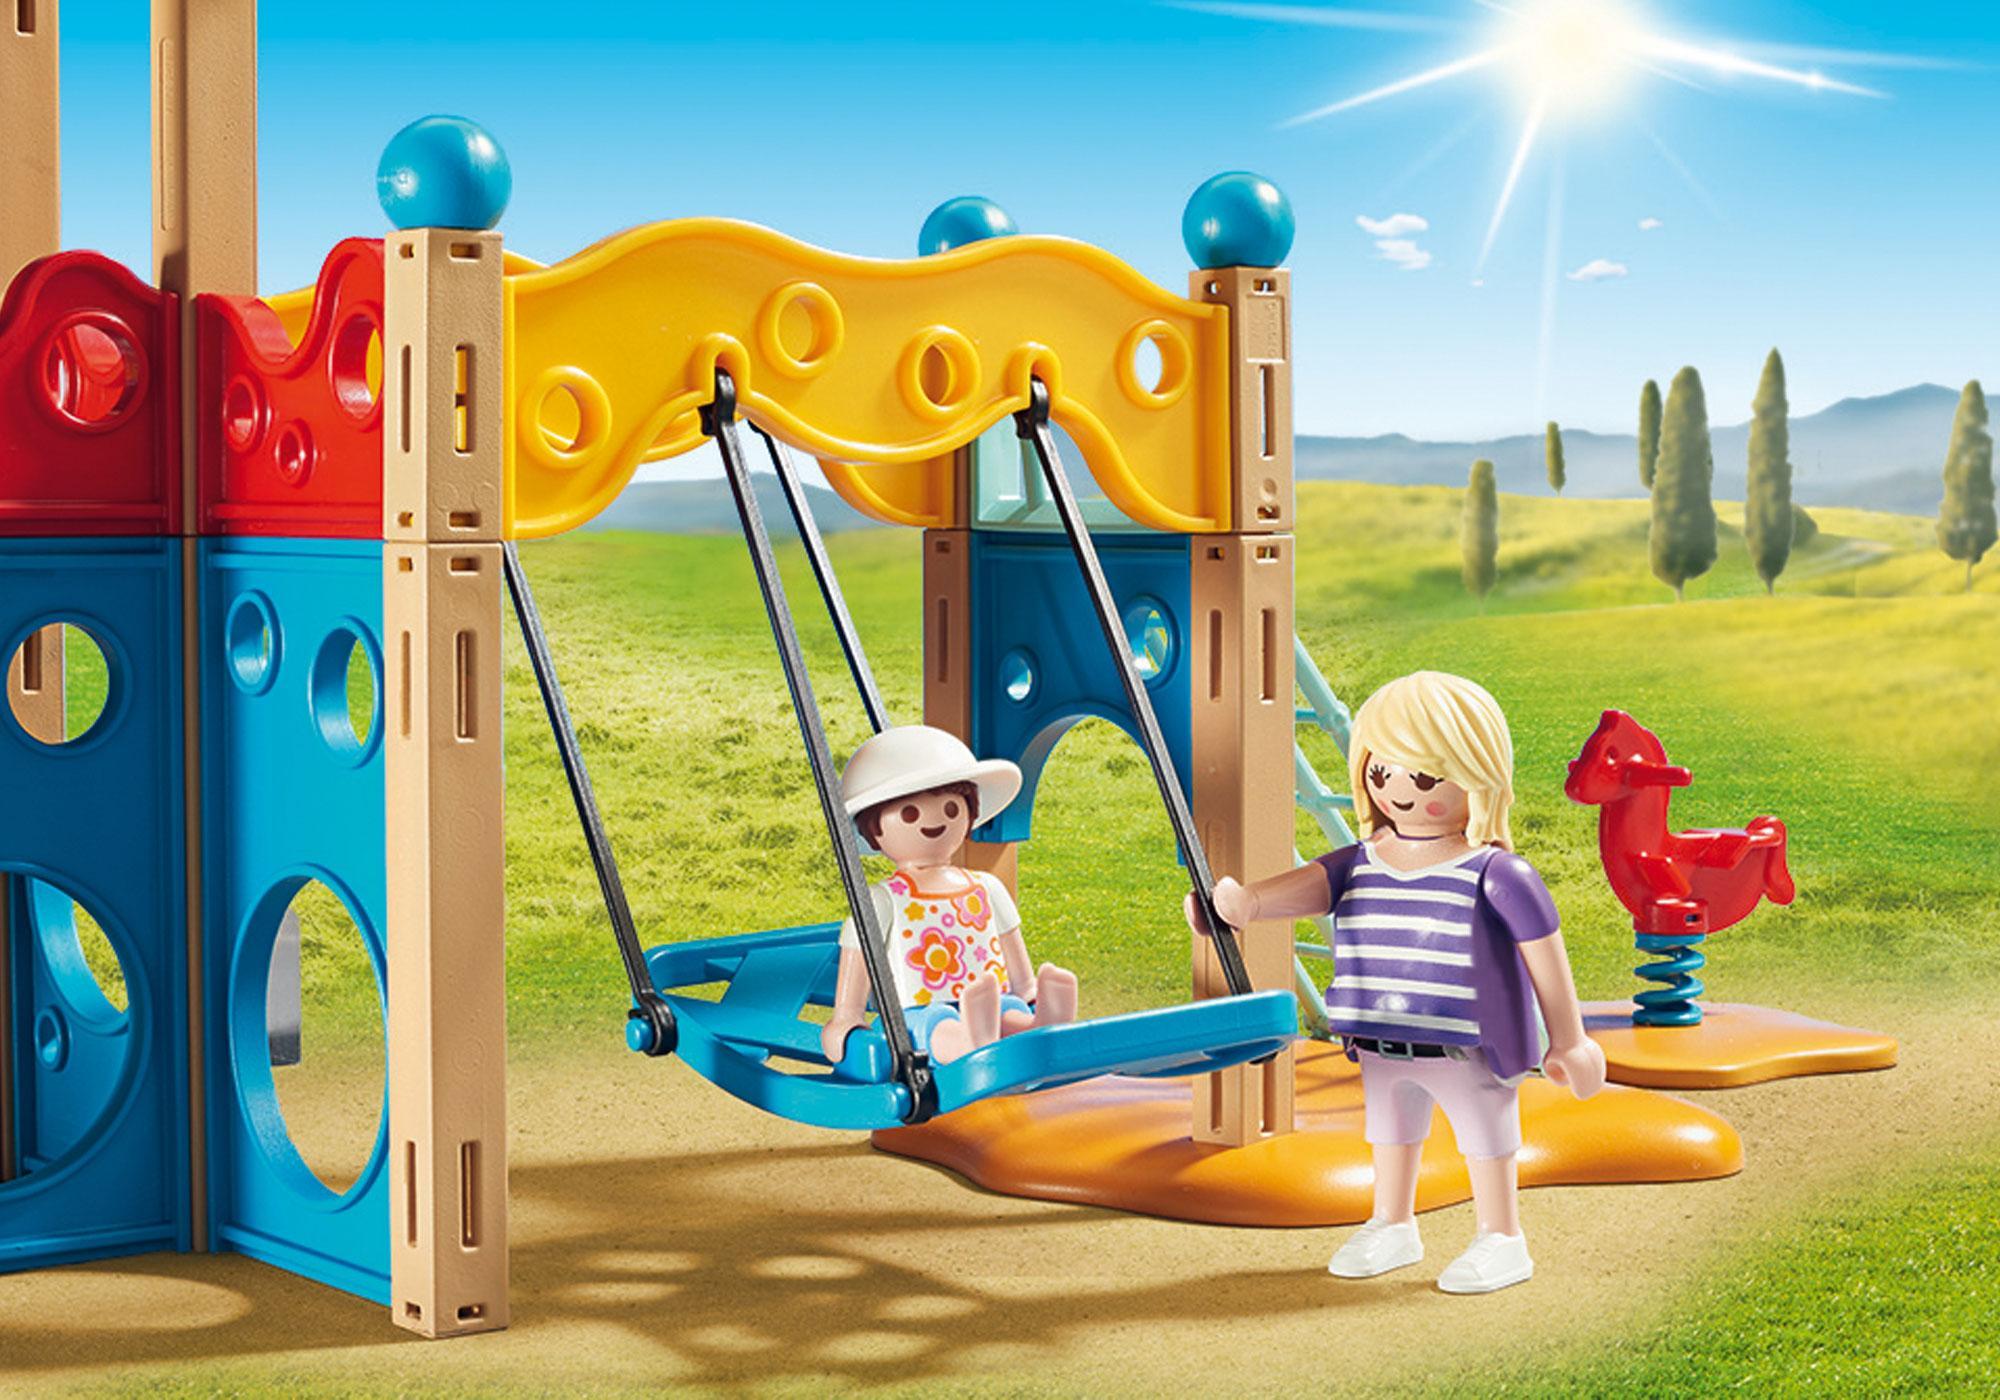 http://media.playmobil.com/i/playmobil/9423_product_extra3/Großer Spielplatz